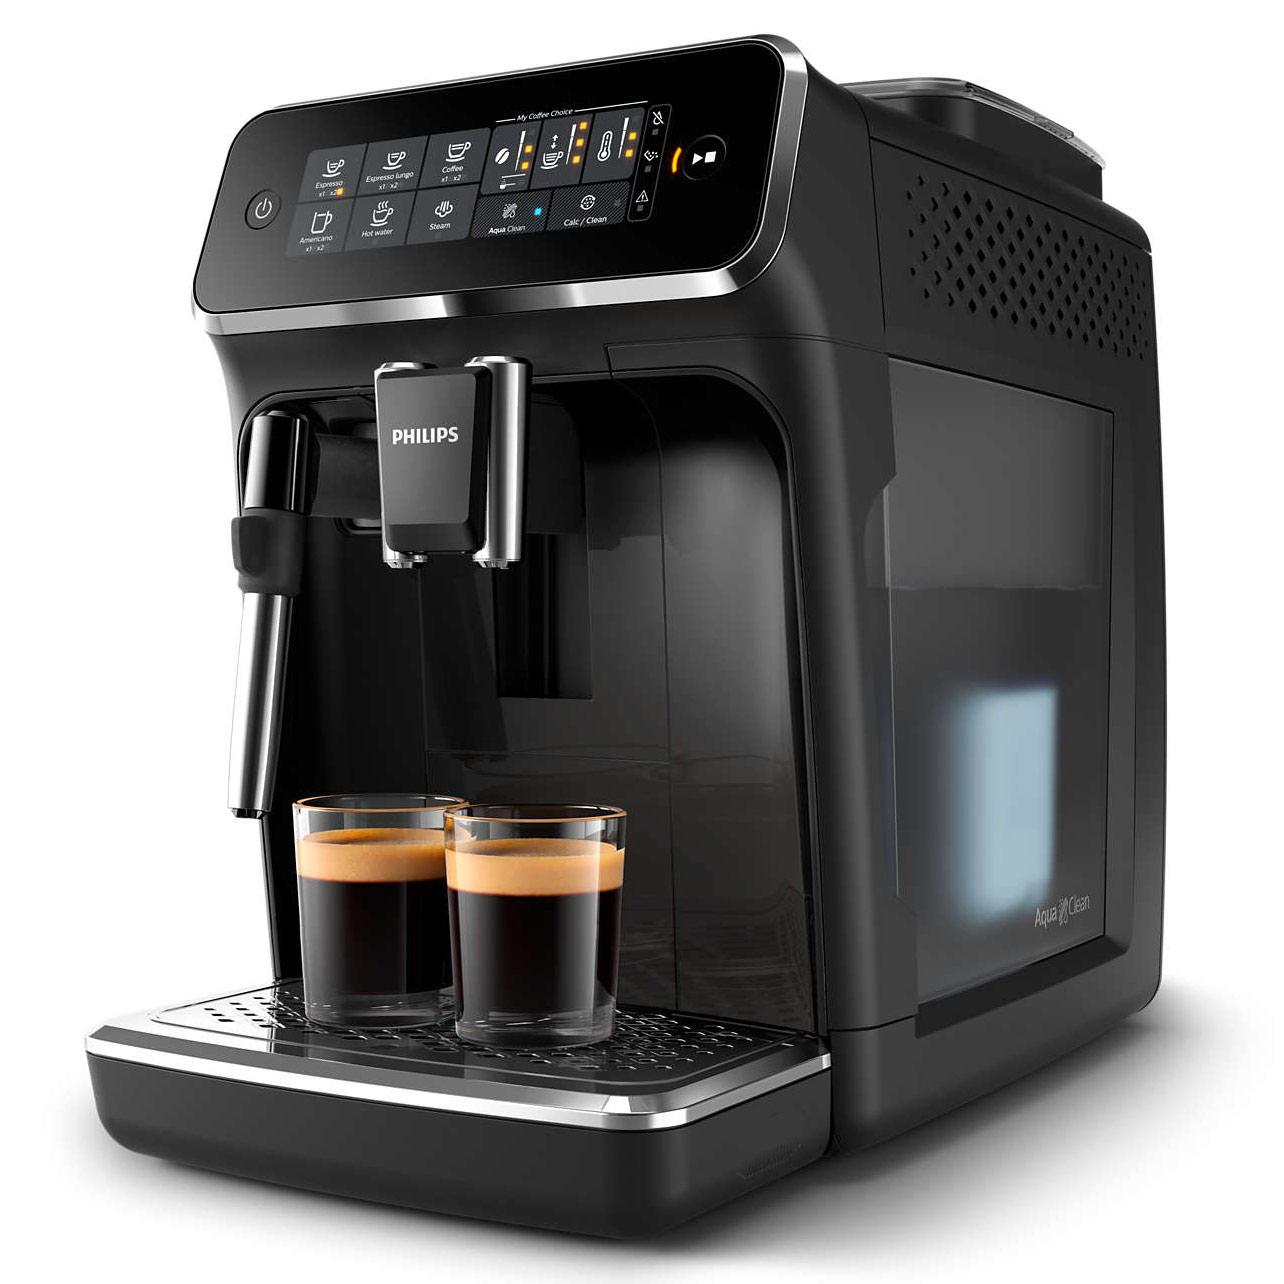 Philips / Saeco 3200 Series Classic Milk Frother Super Automatic Espresso Machine - EP3221/44